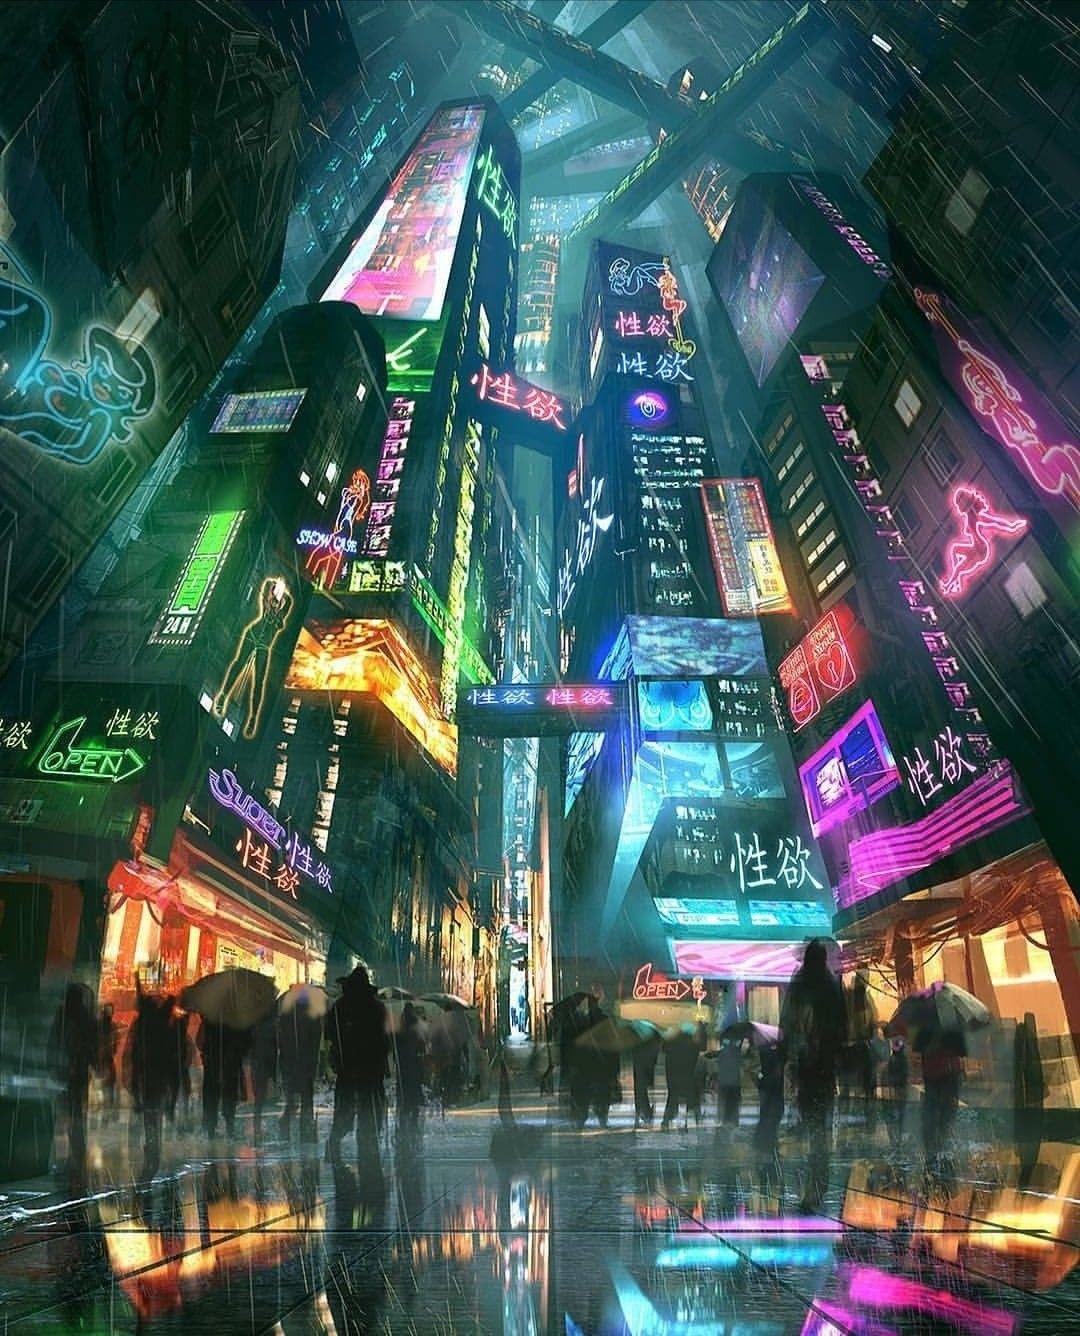 subscribe Pinterest piroz_zhok Cyberpunk city